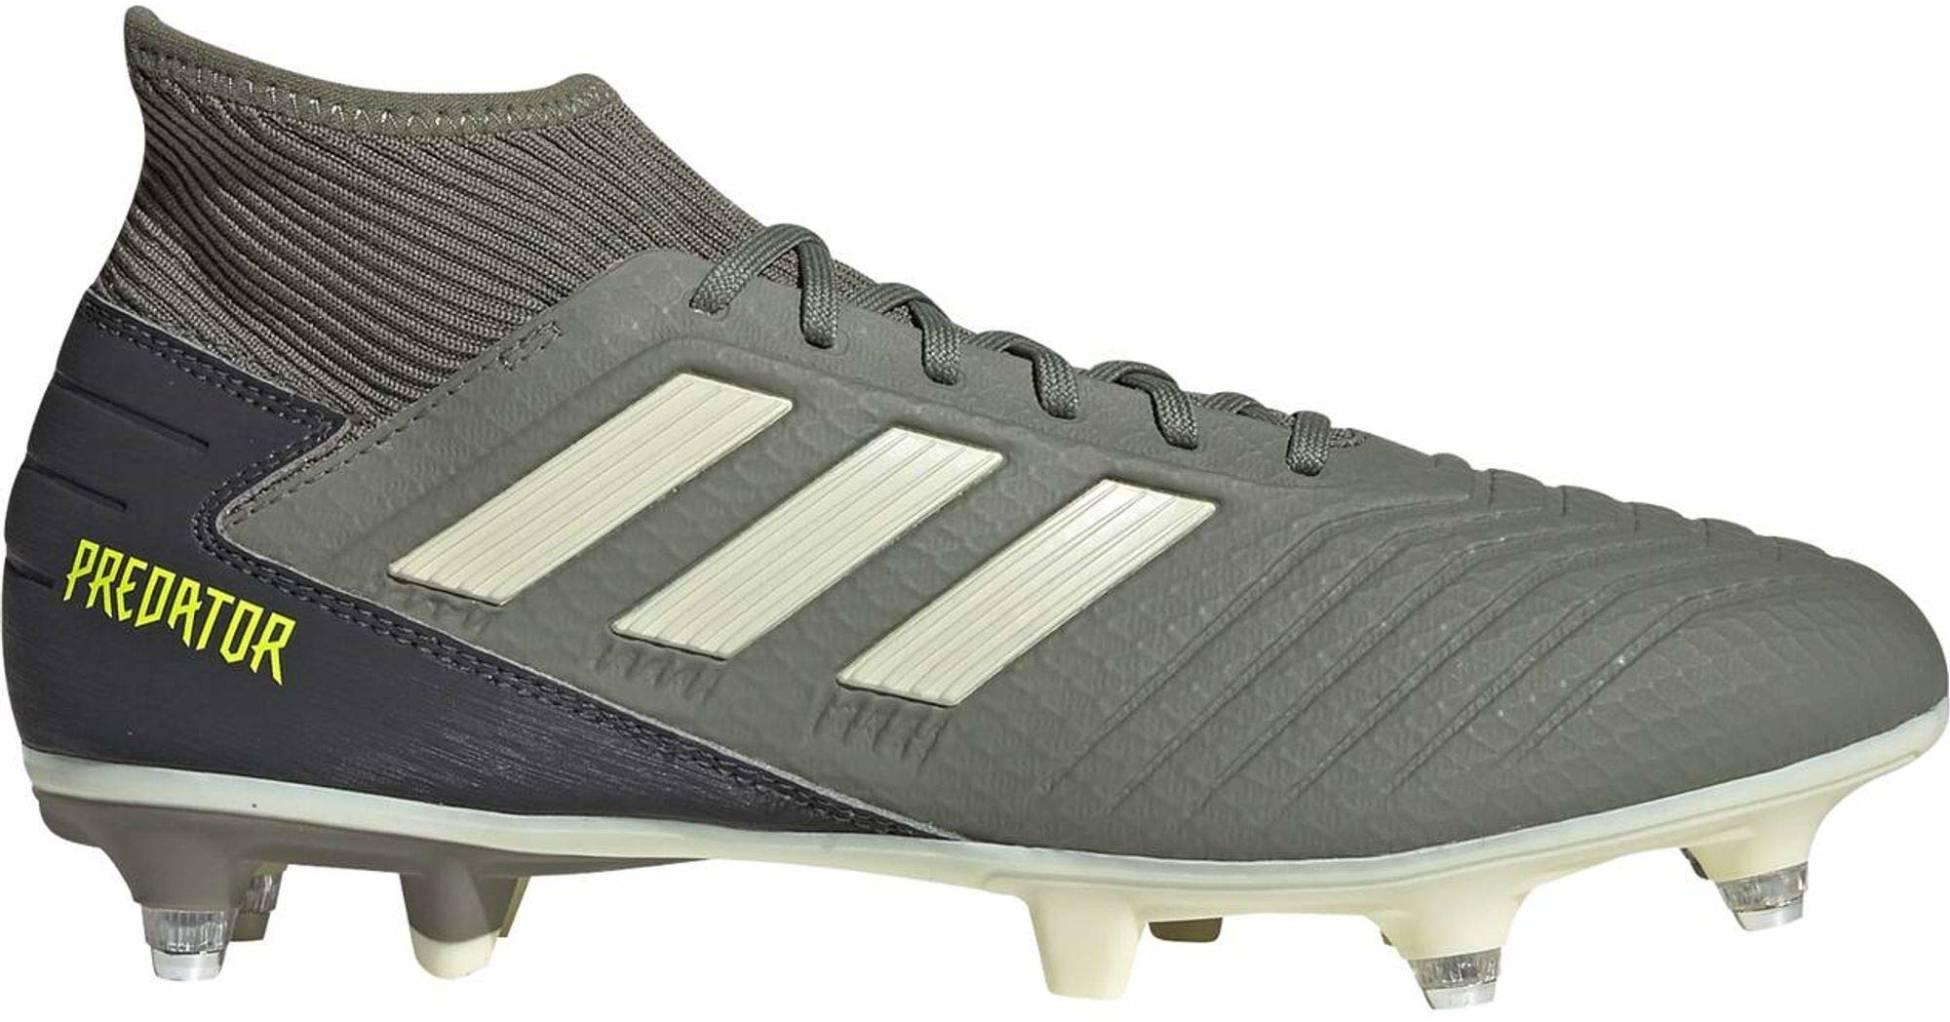 Adidas Predator 19.3 Soft Ground